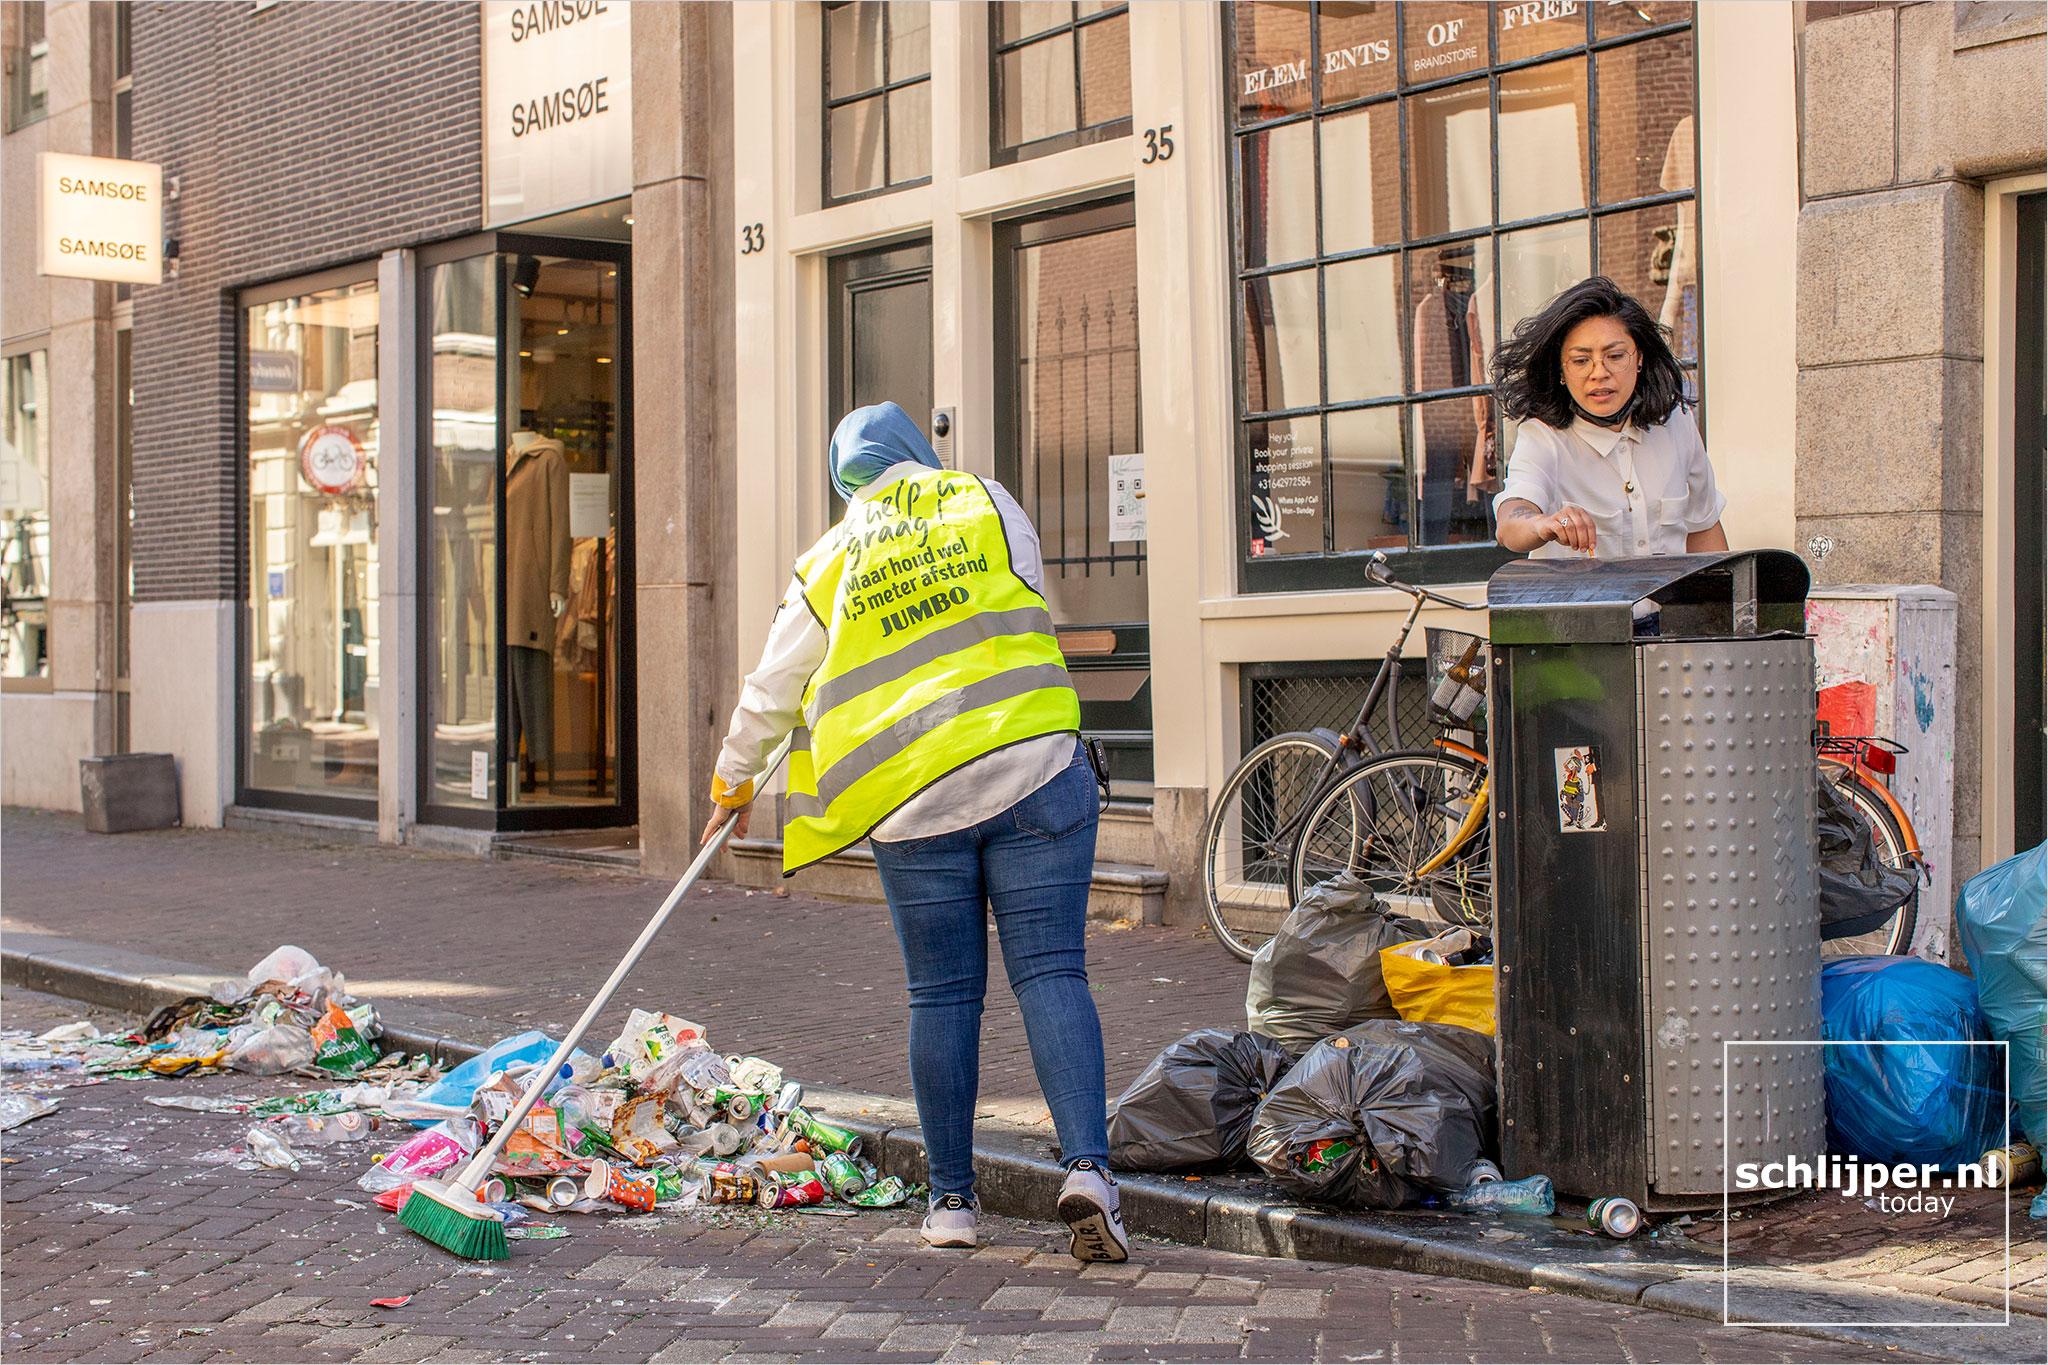 The Netherlands, Amsterdam, 28 april 2021